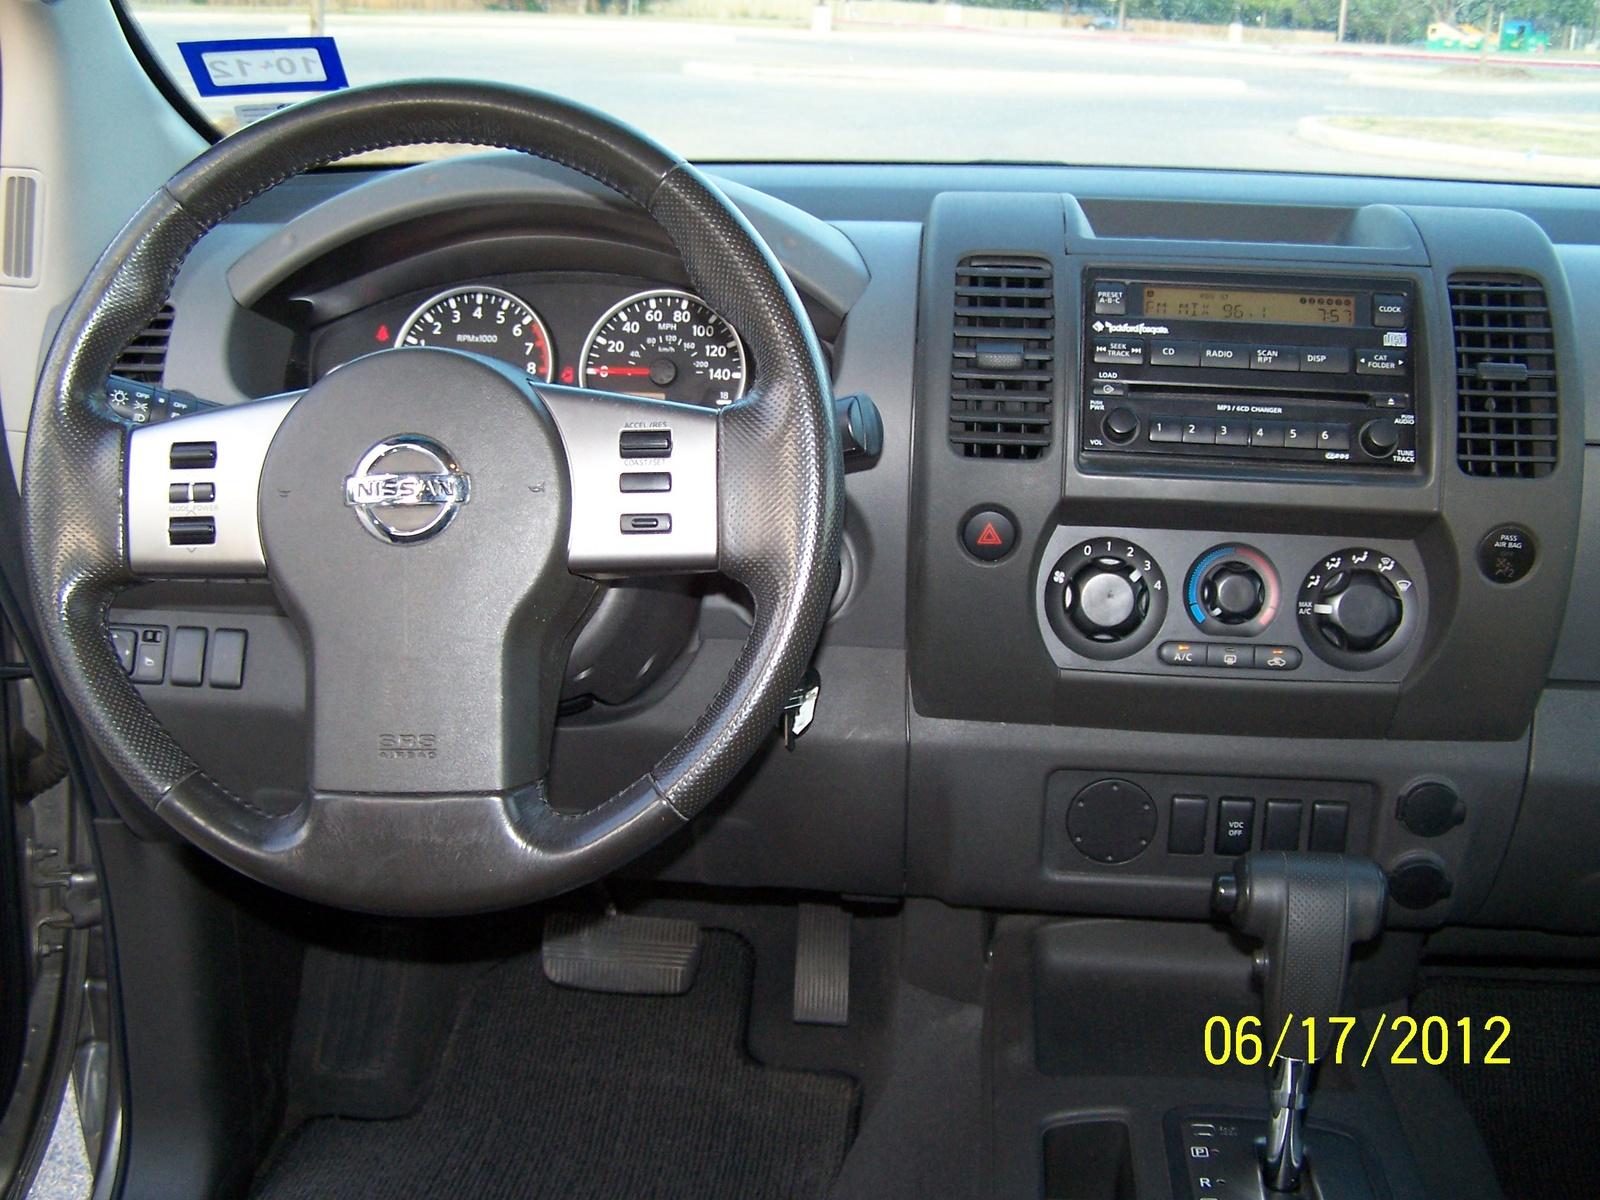 2006 Nissan Xterra Information And Photos Zombiedrive. 2006 Nissan Xterra 21. Nissan. 2006 Nissan Xterra Interior Dash Diagrams At Scoala.co